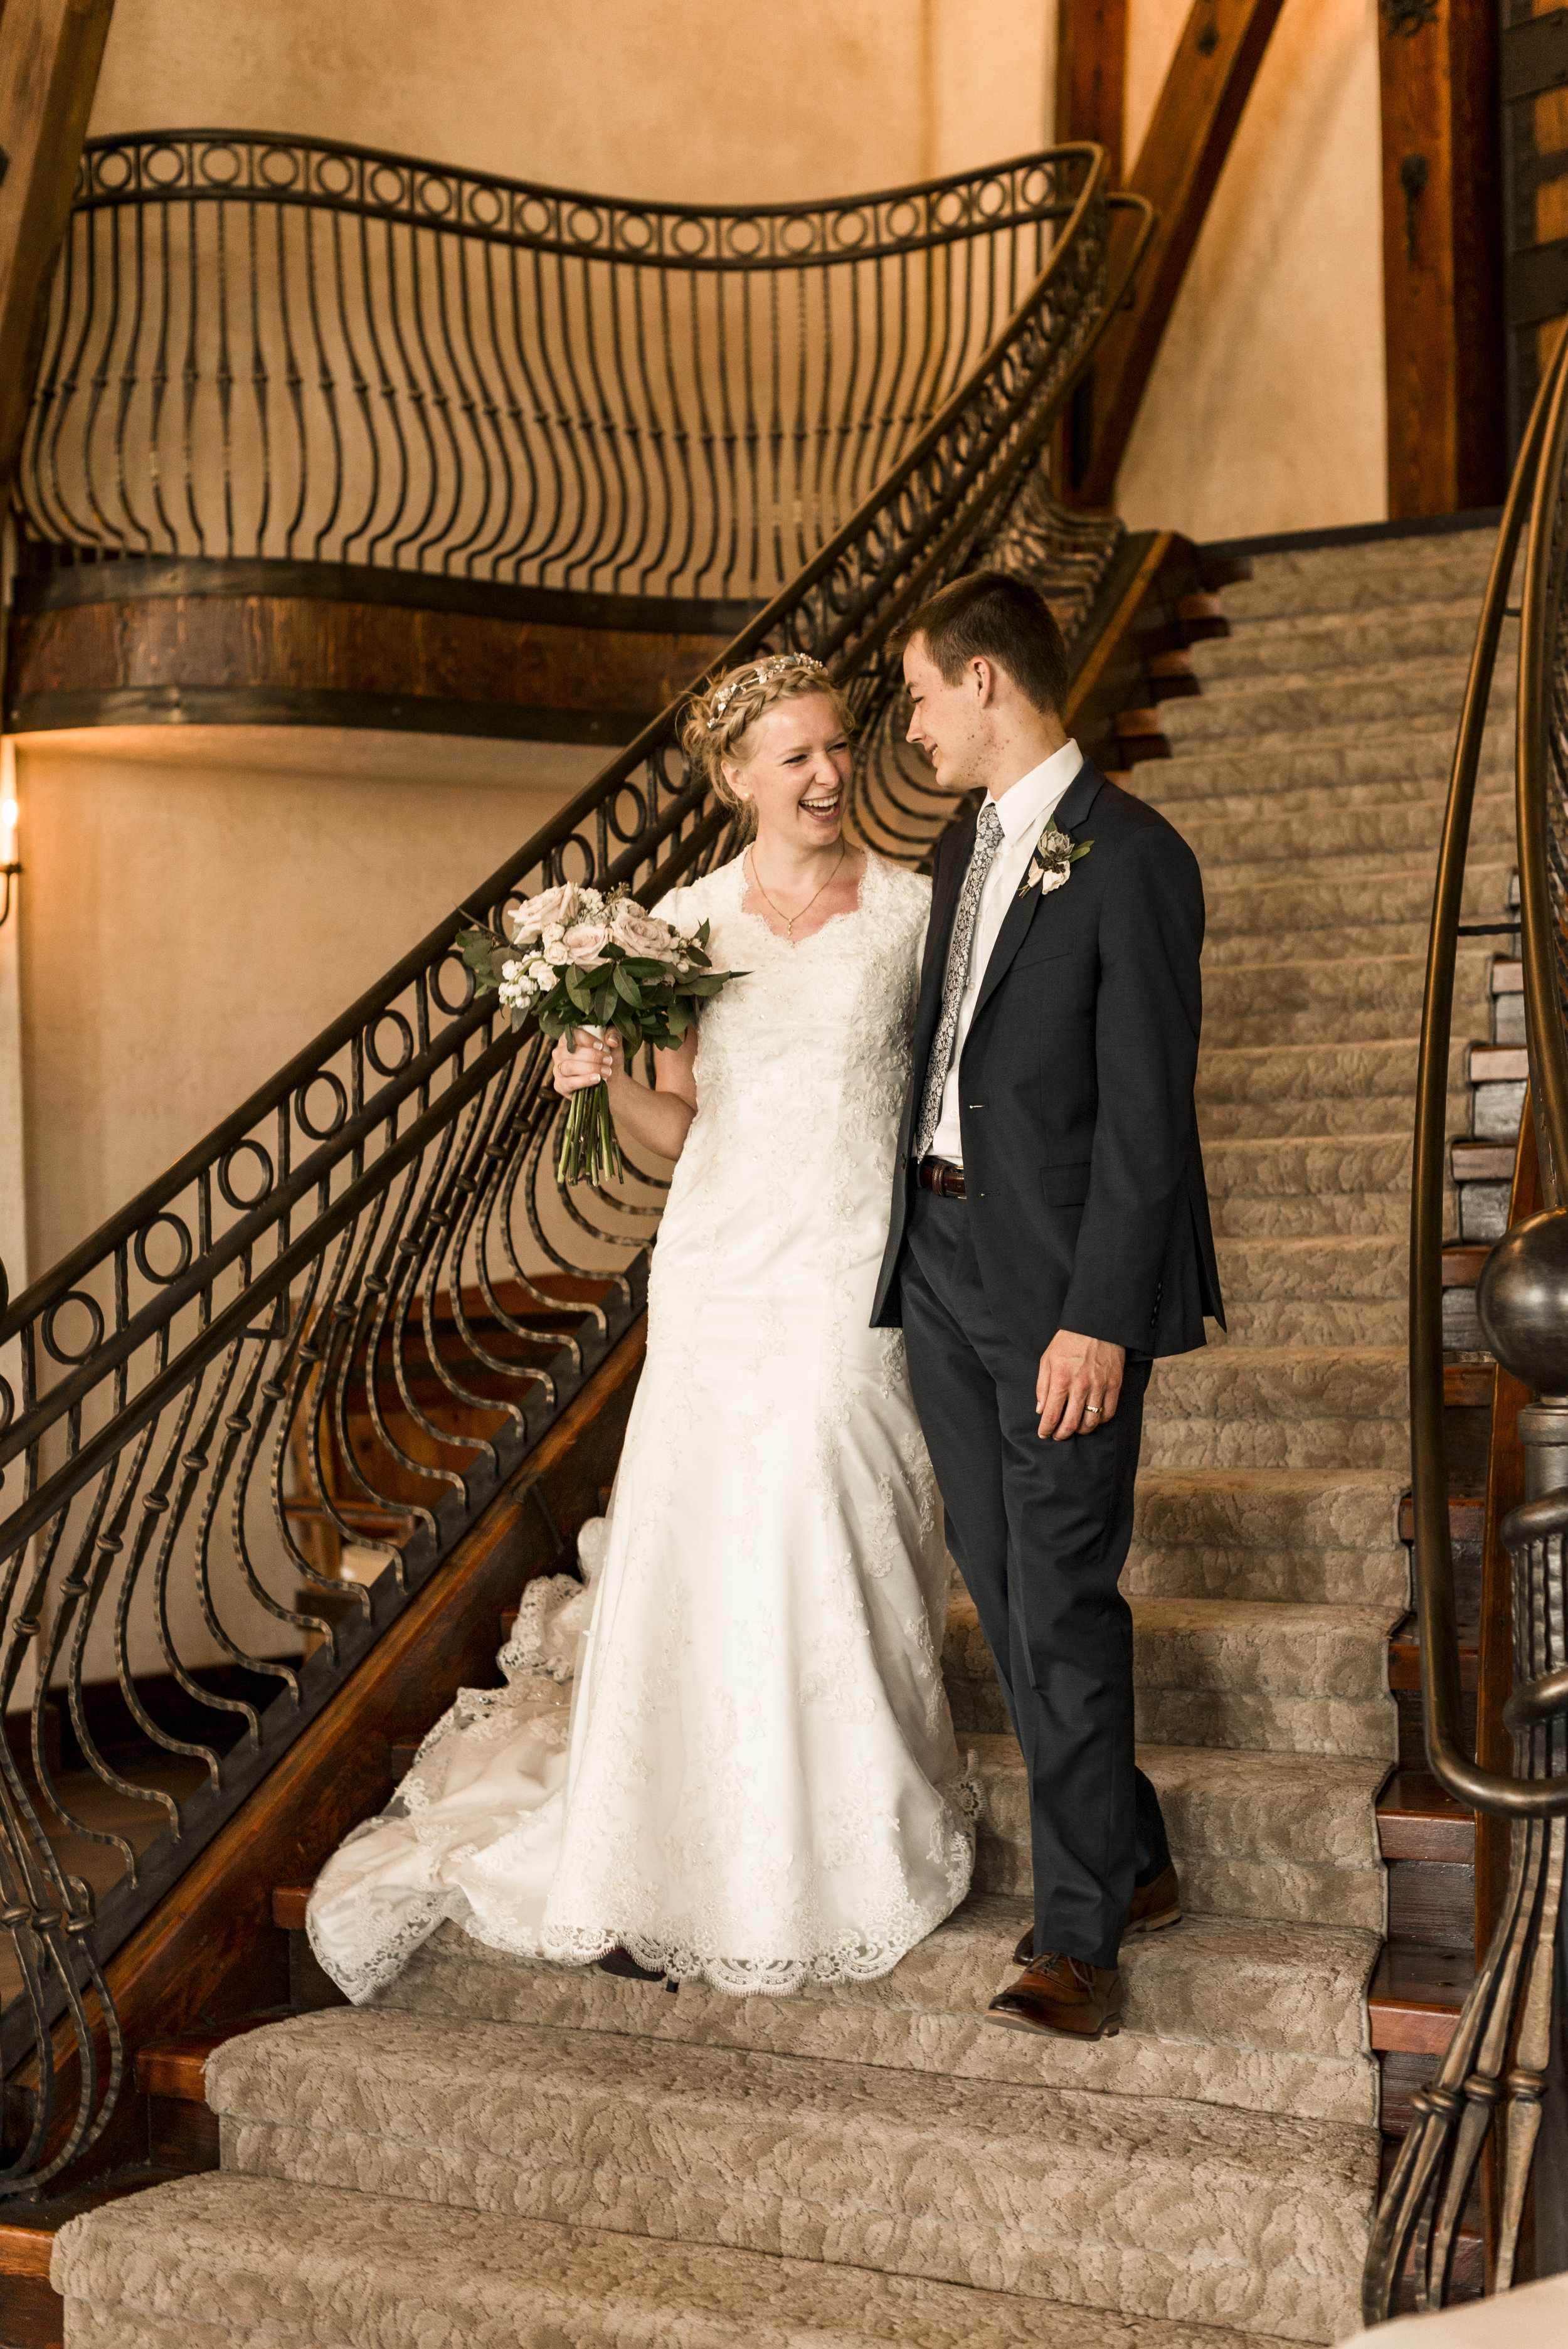 LDS Summer Wedding | Wadley Farm Lindon, Utah Wedding Photographer| Bri Bergman Photography 02.JPG